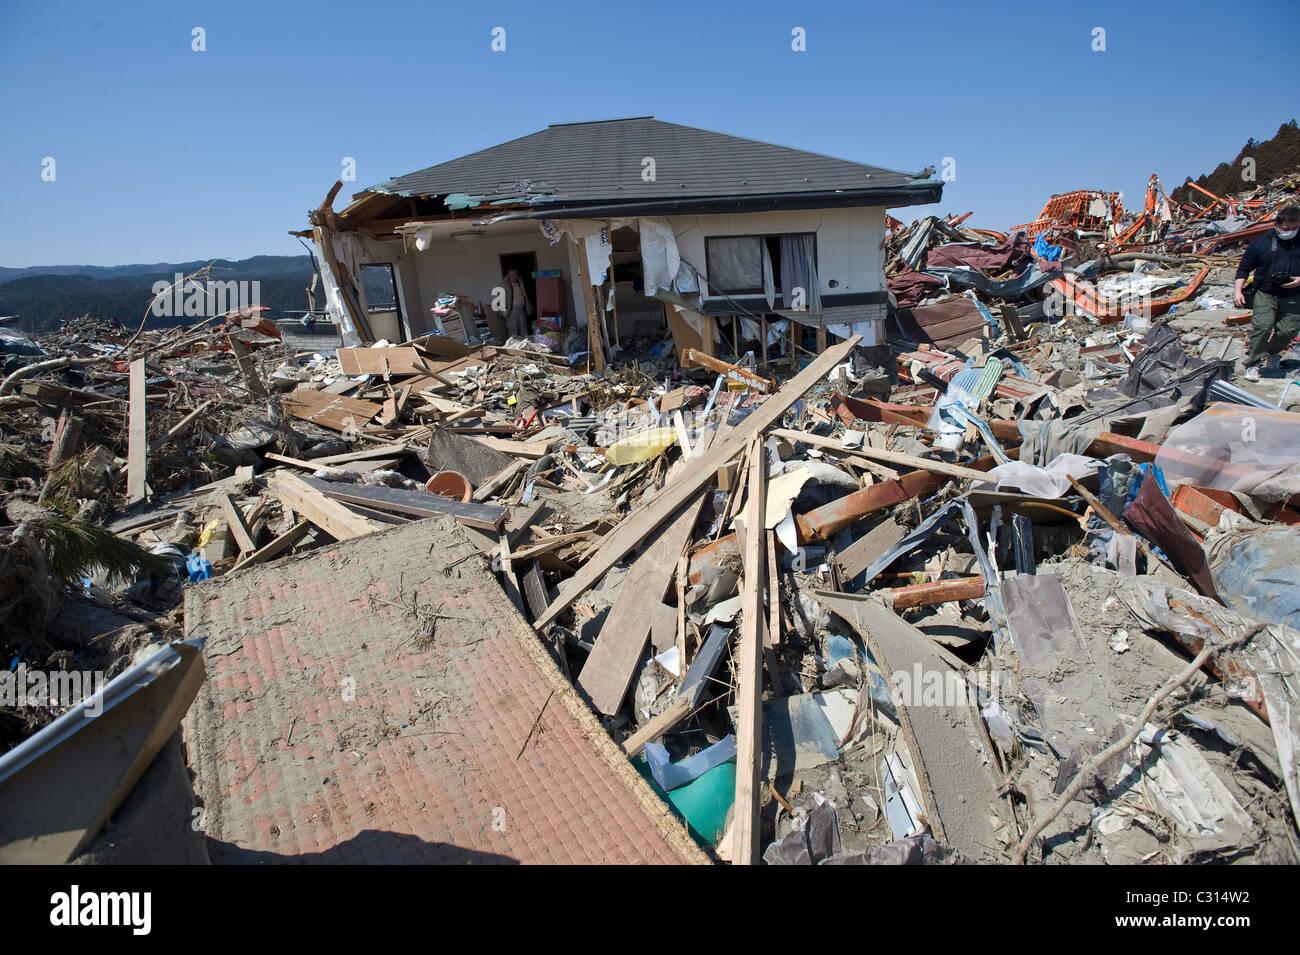 Katsunari Sasaki, 76, looks through the wreckage of his home which was moved 700 meters in Rikuzentakata, Japan - Stock Image